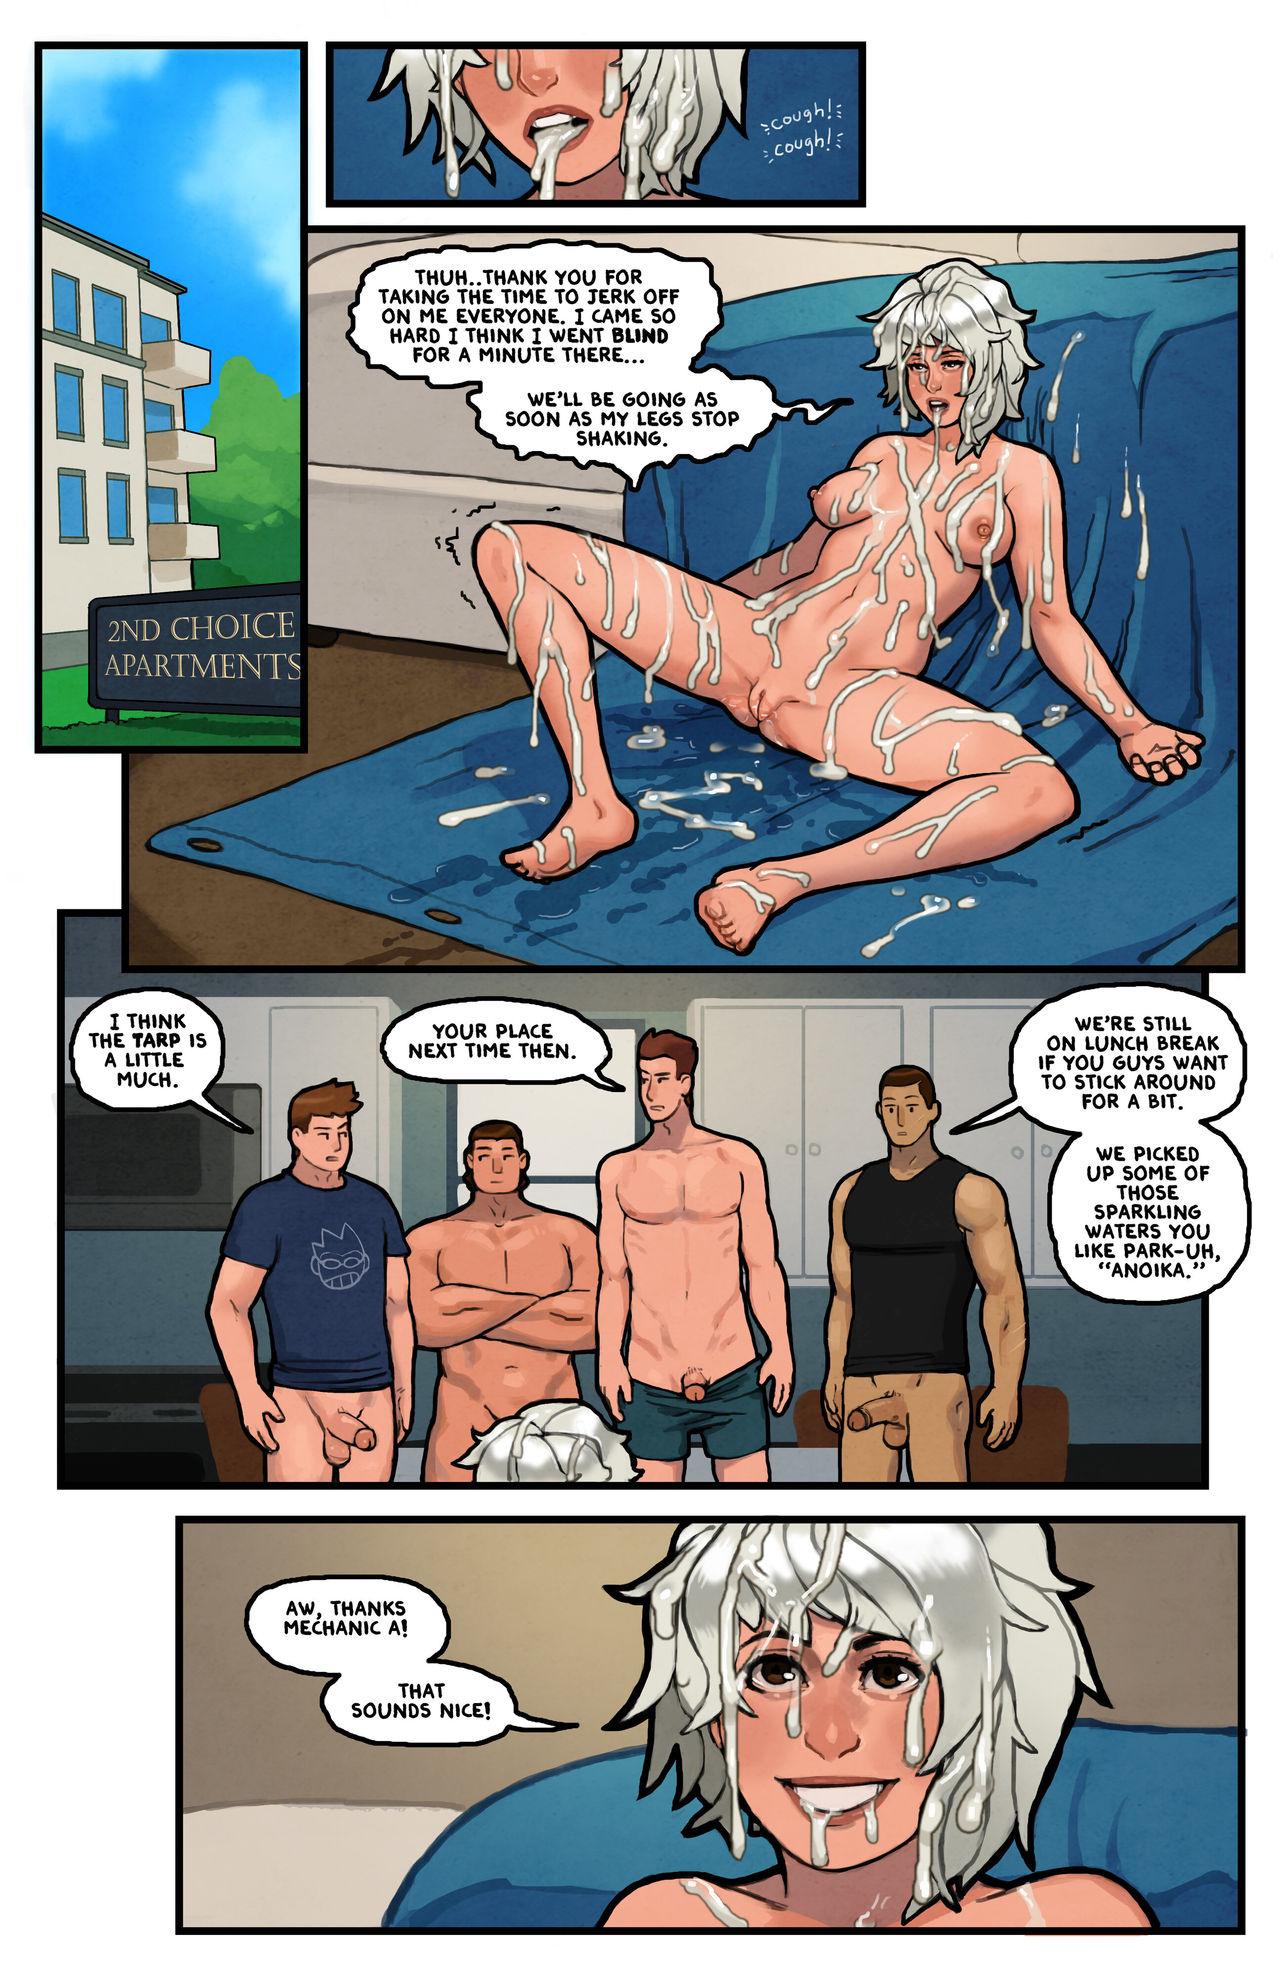 This Romantic World porn comics Big Tits, Blowjob, Creampie, Cum Shots, Cum Swallow, Lesbians, Oral sex, Straight